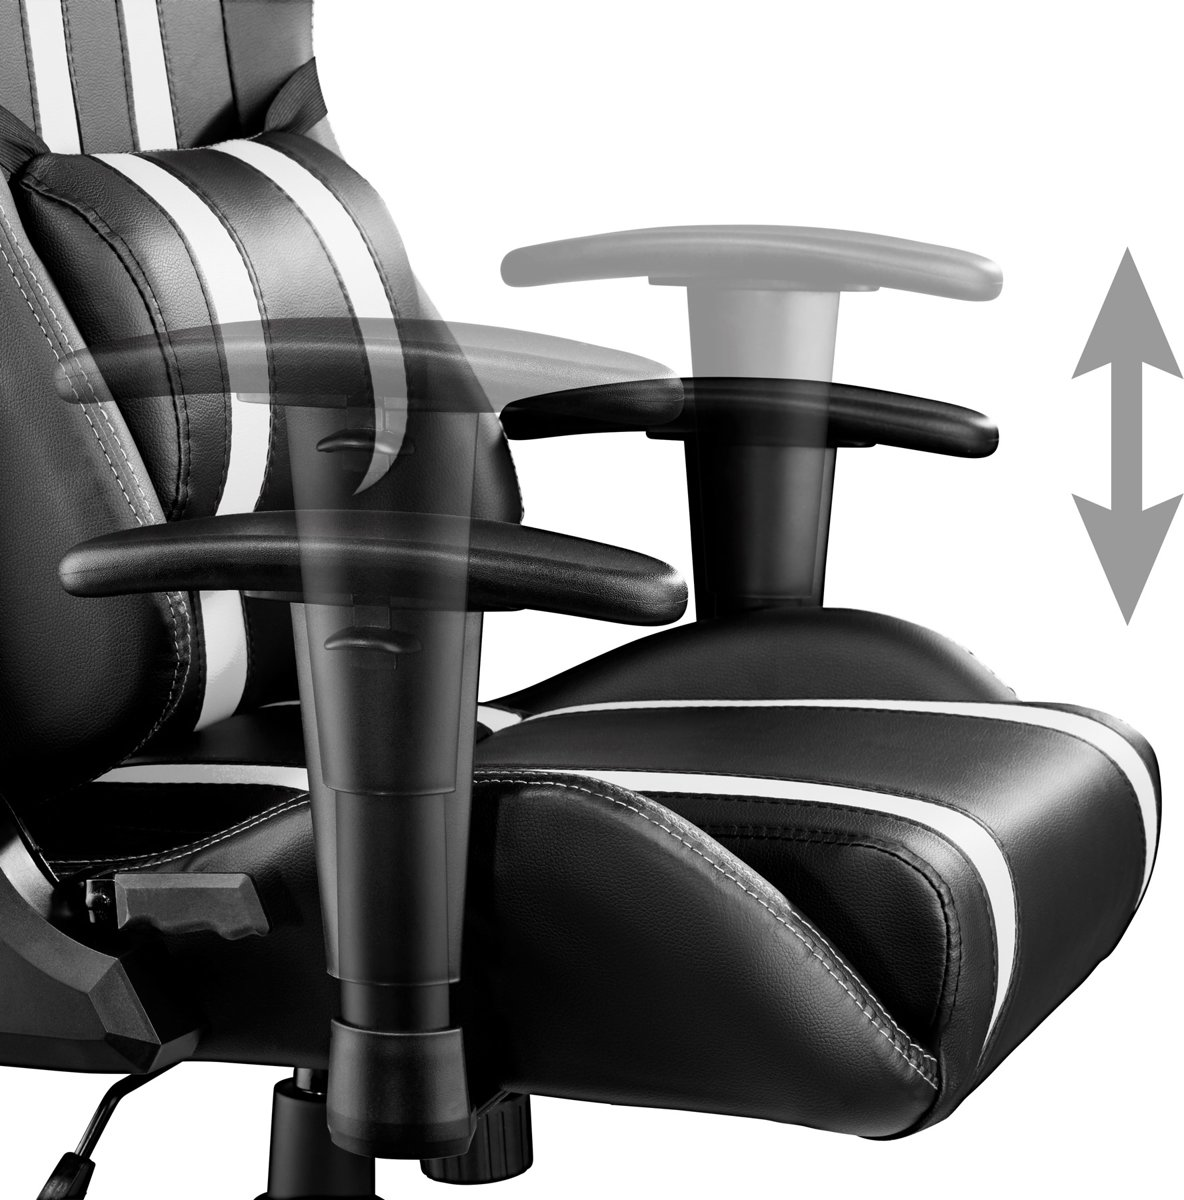 Peachy Tectake Gaming Chair Bureaustoel Premium Racing Style Zwart Wit Pdpeps Interior Chair Design Pdpepsorg